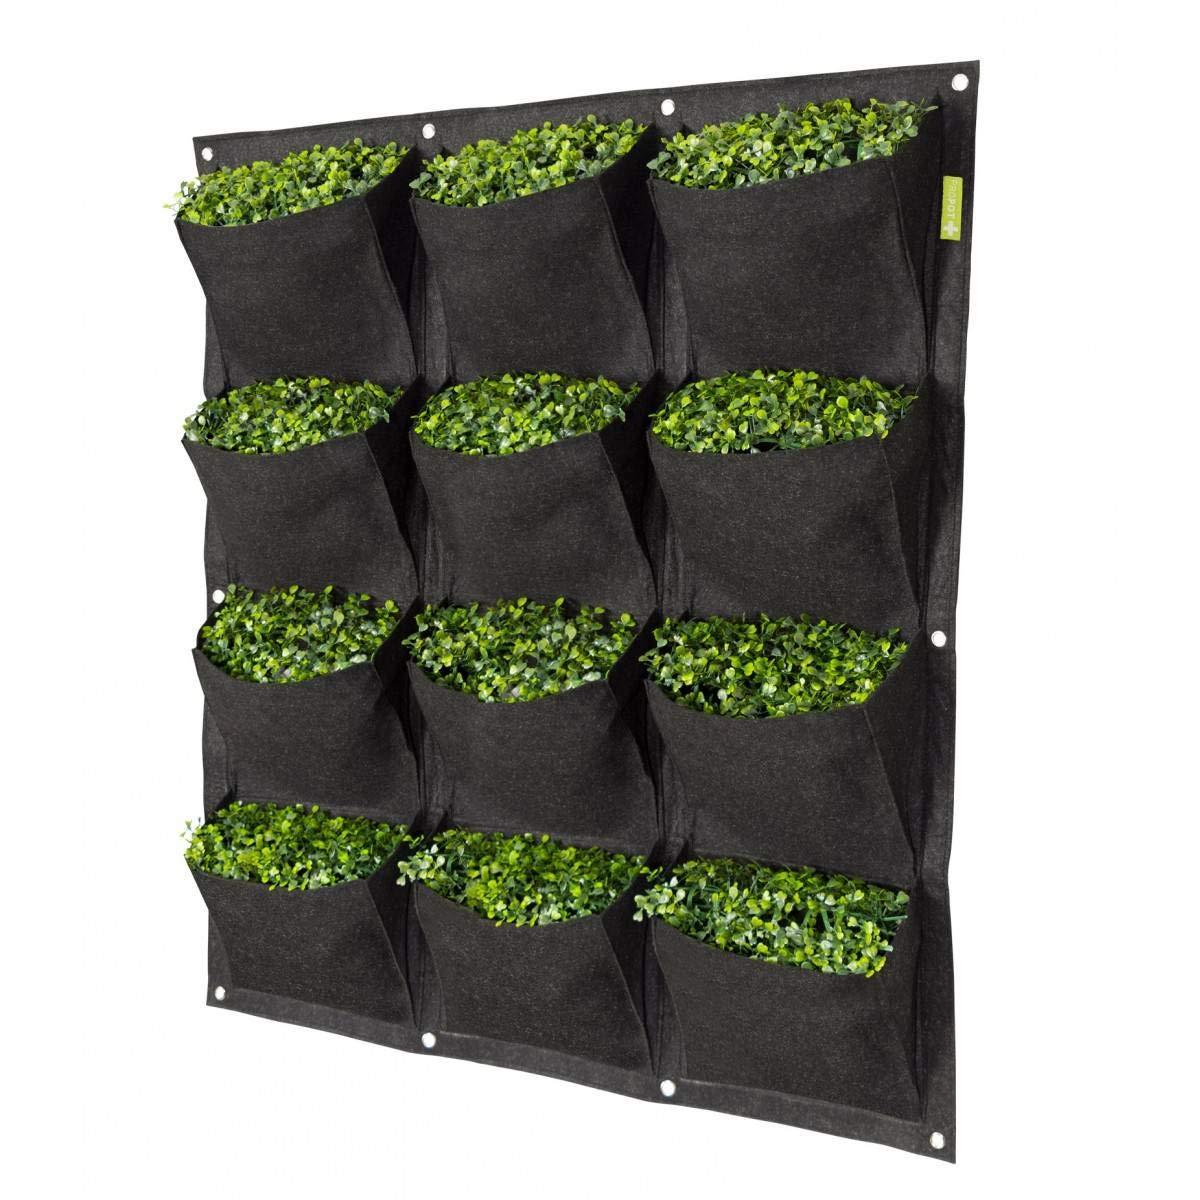 Garden HighPro - Vaso da Parete vegetale, Decorazione da Parete, 12 Tasche, 90 x 100 cm